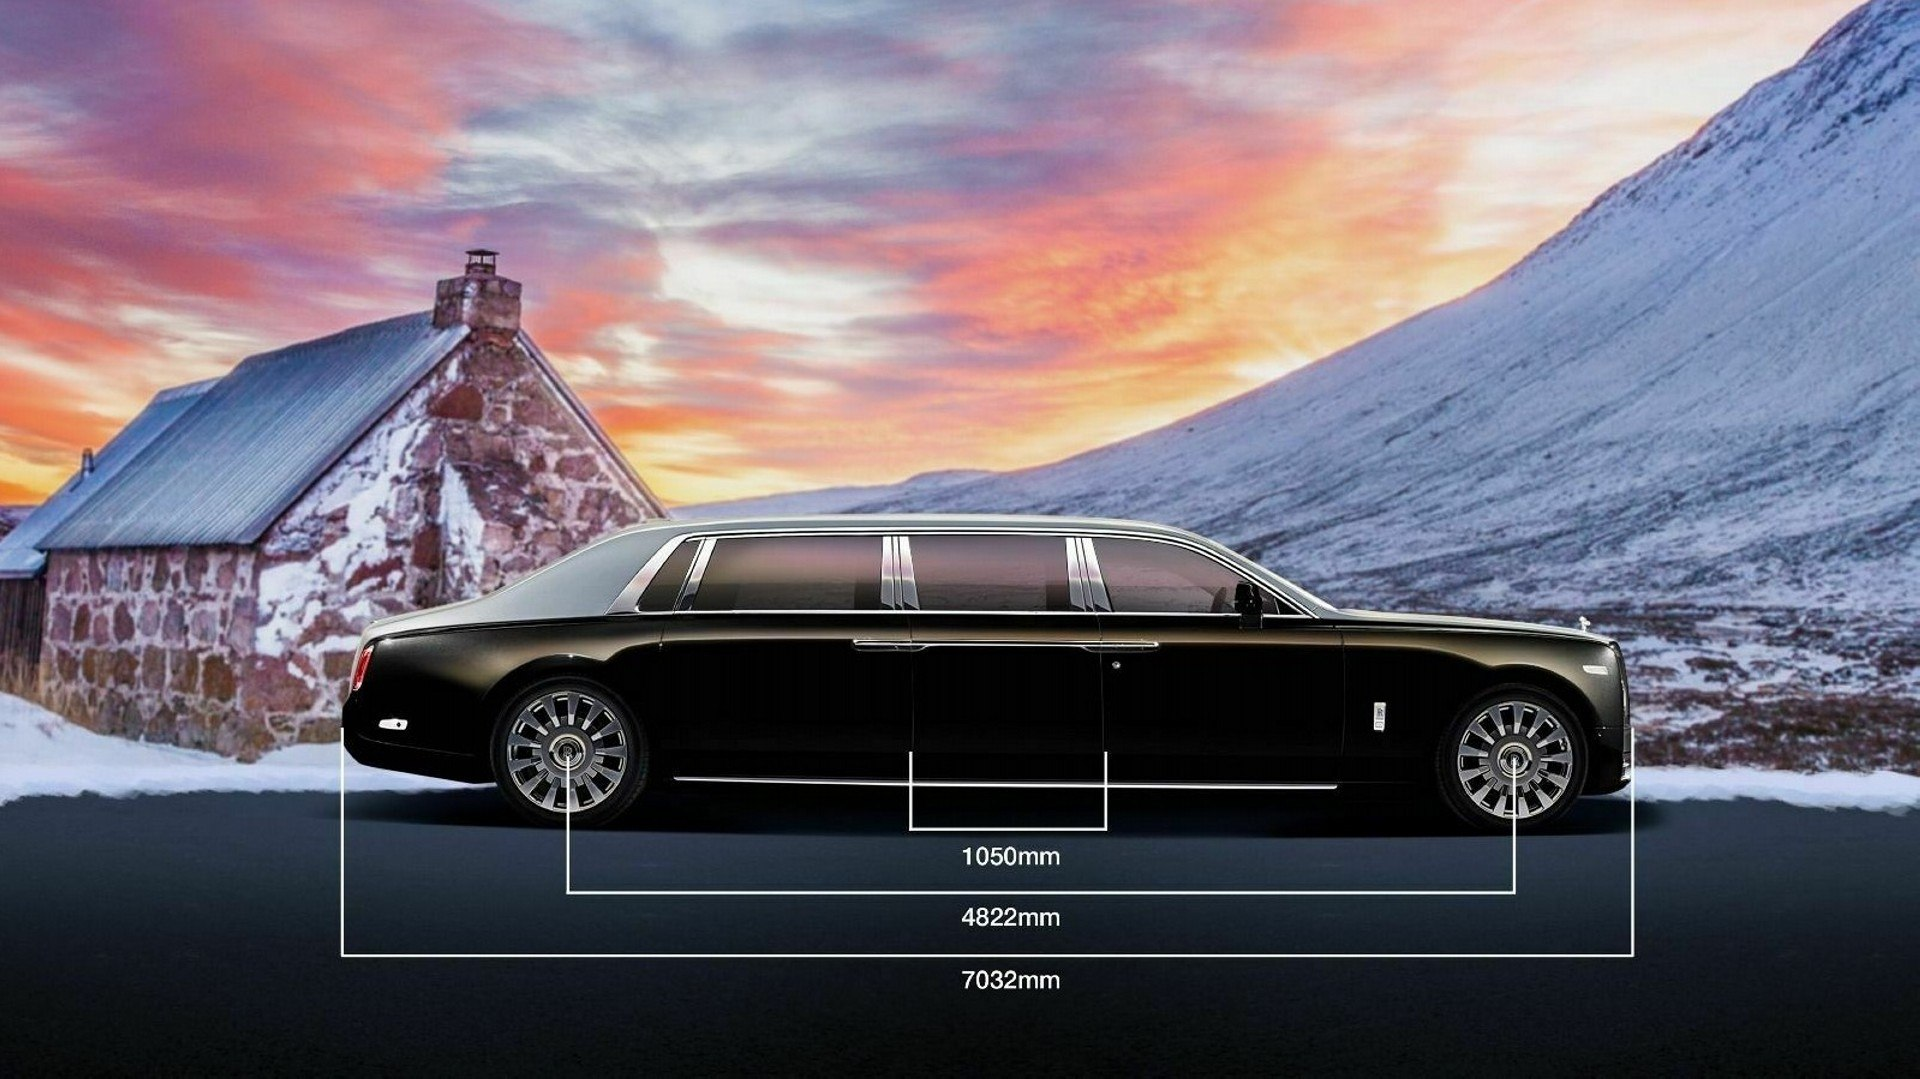 Rolls Royce Phantom Klassen Blindado (6)